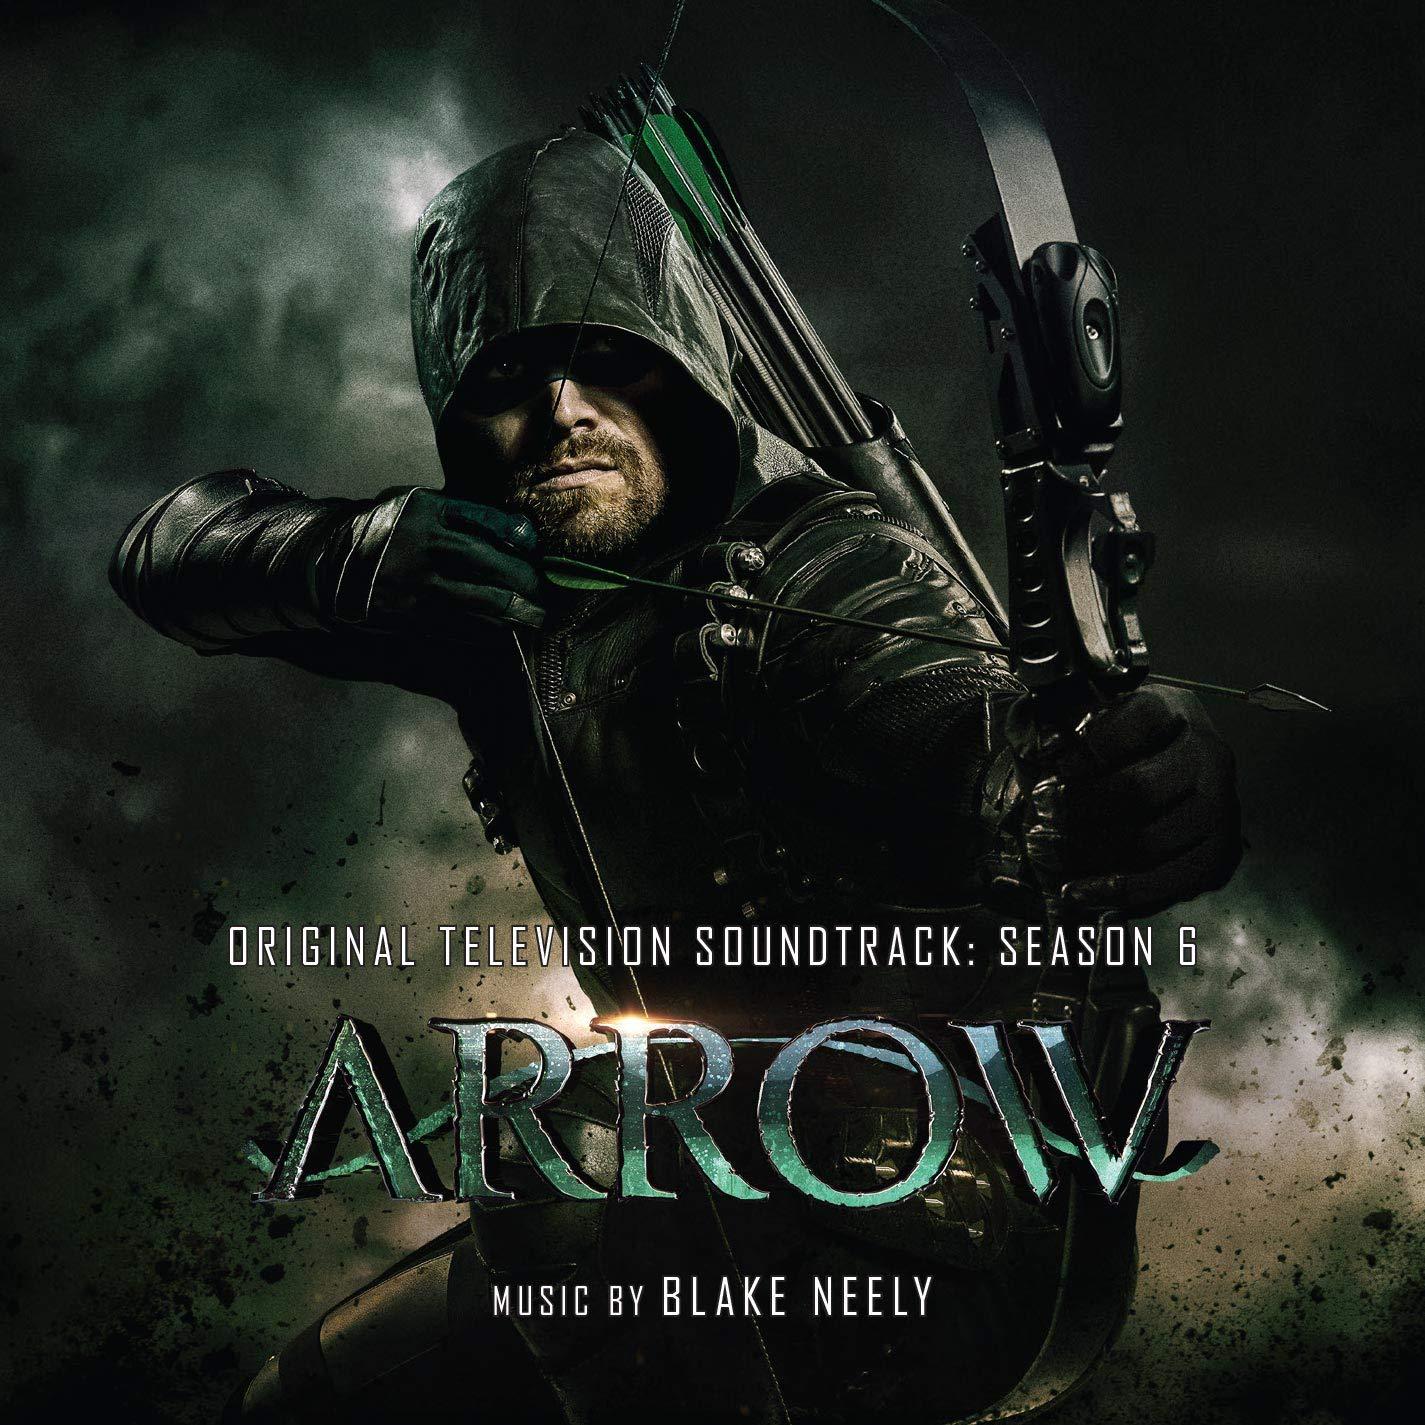 Arrow - Original Television Soundtrack Season 6.png